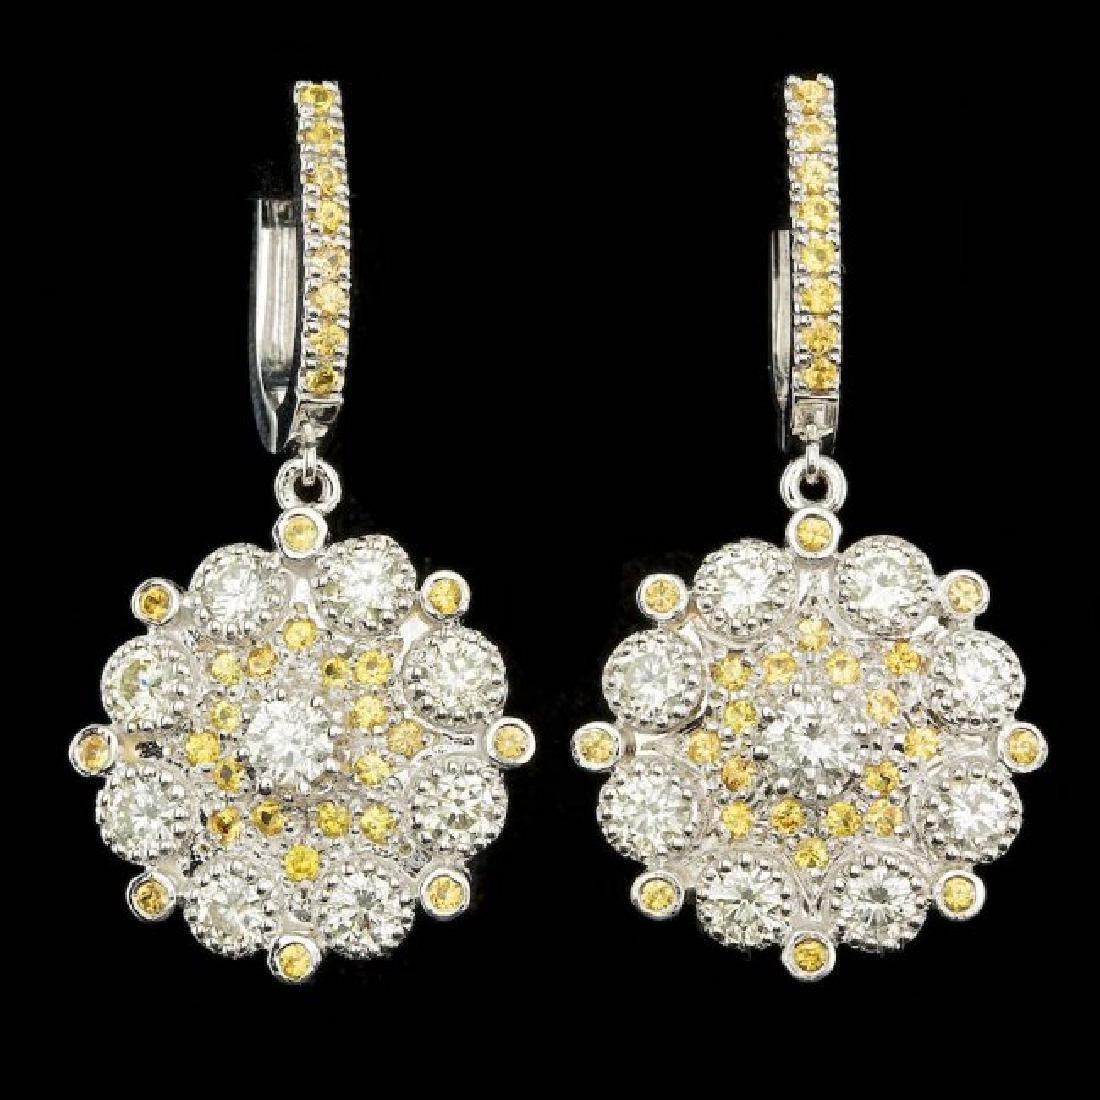 14k Gold 3.50ct Diamond 1.50ct Sapphire Earrings